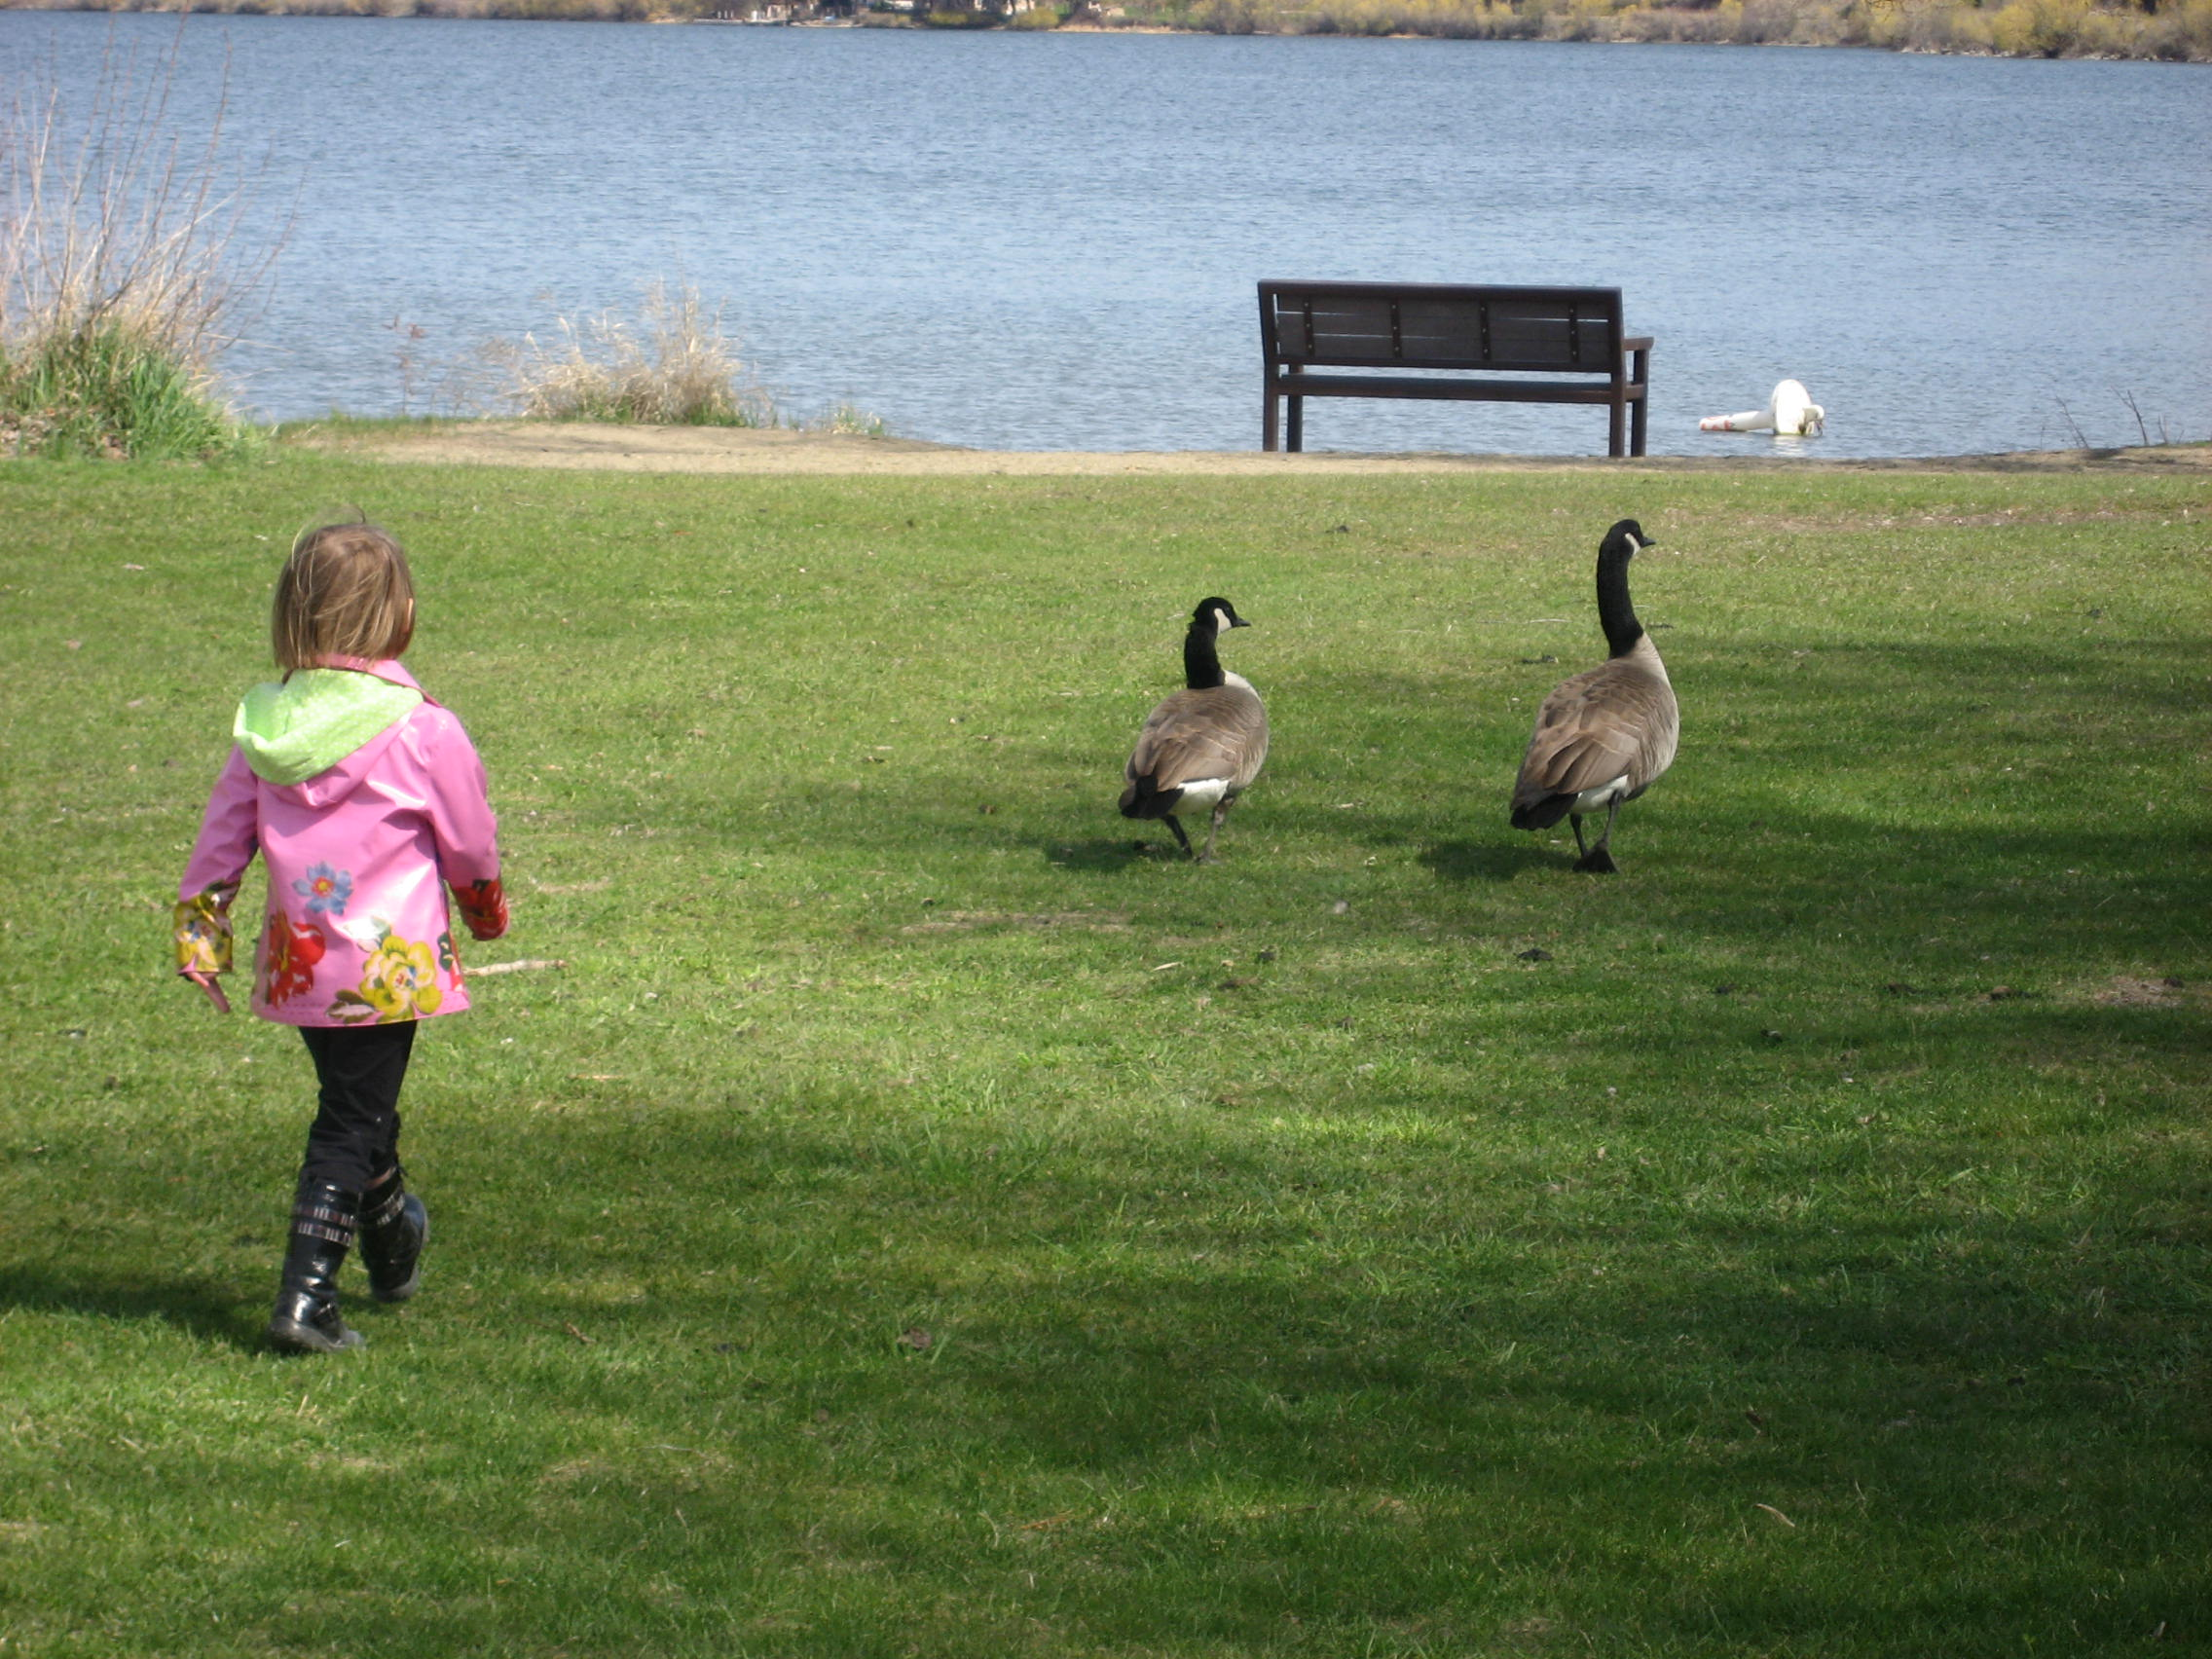 Chasing Ducks Beasley